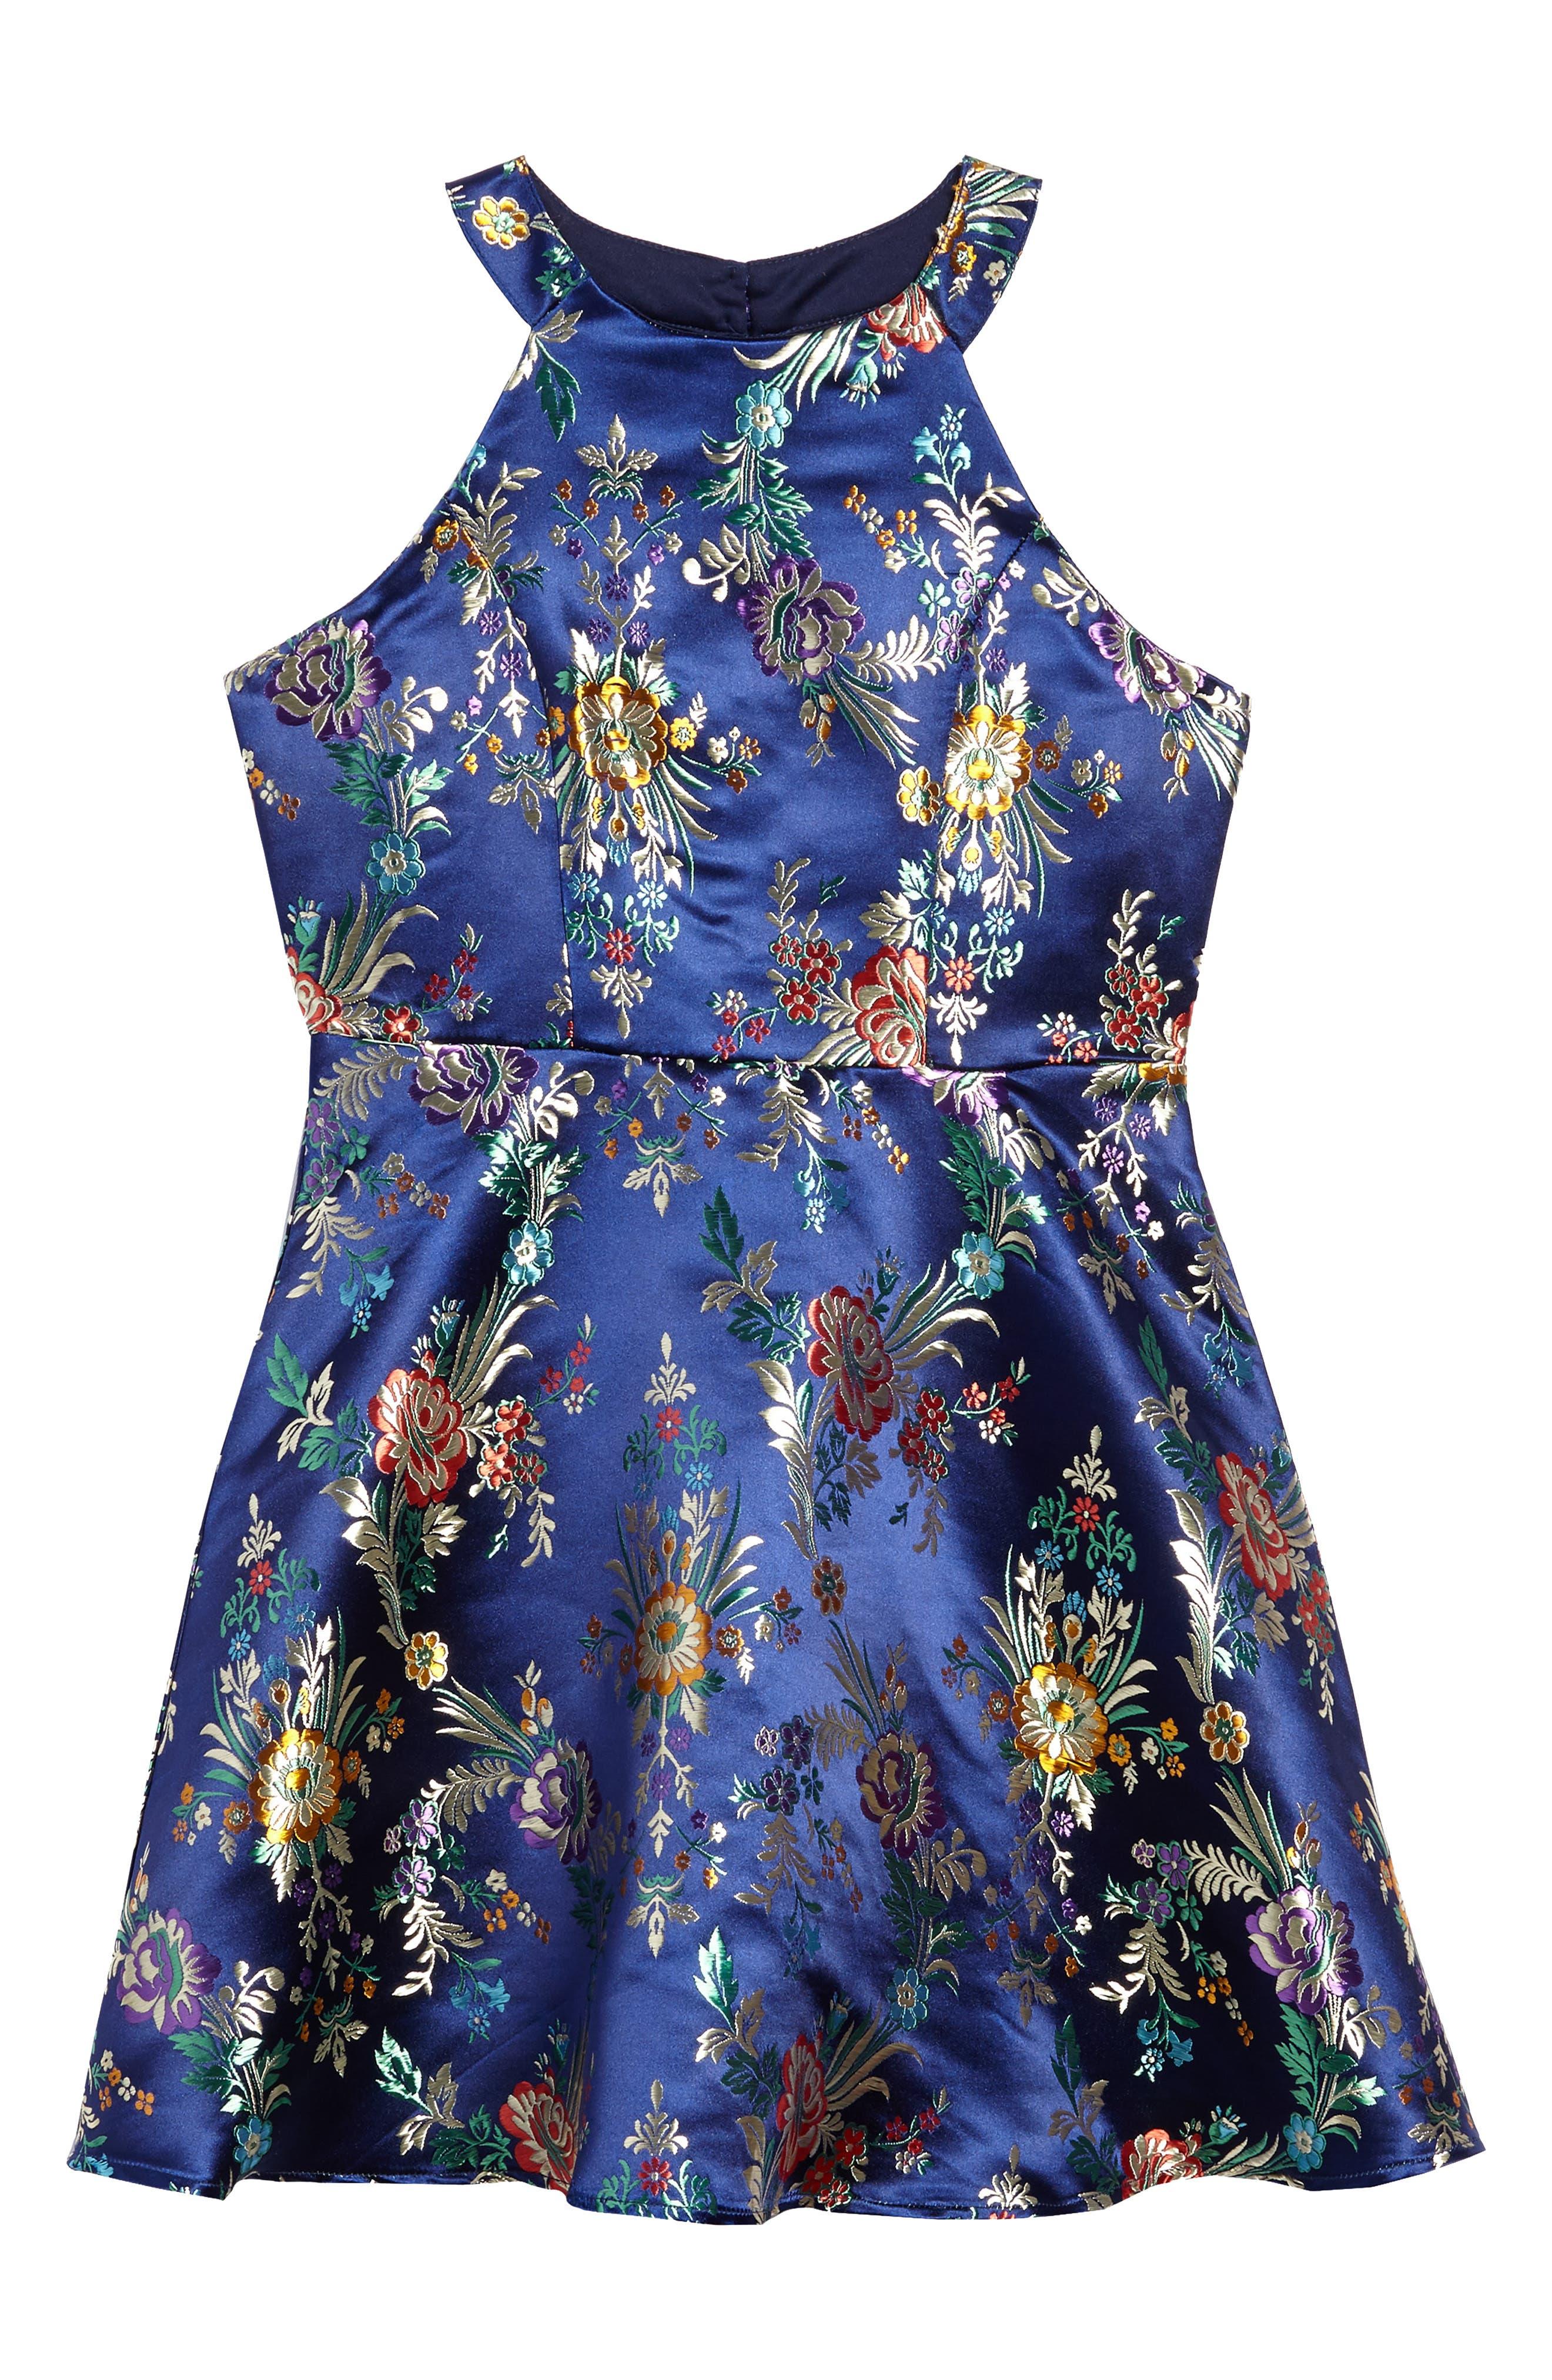 Alternate Image 1 Selected - Trixxi Metallic Floral Jacquard Dress (Big Girls)